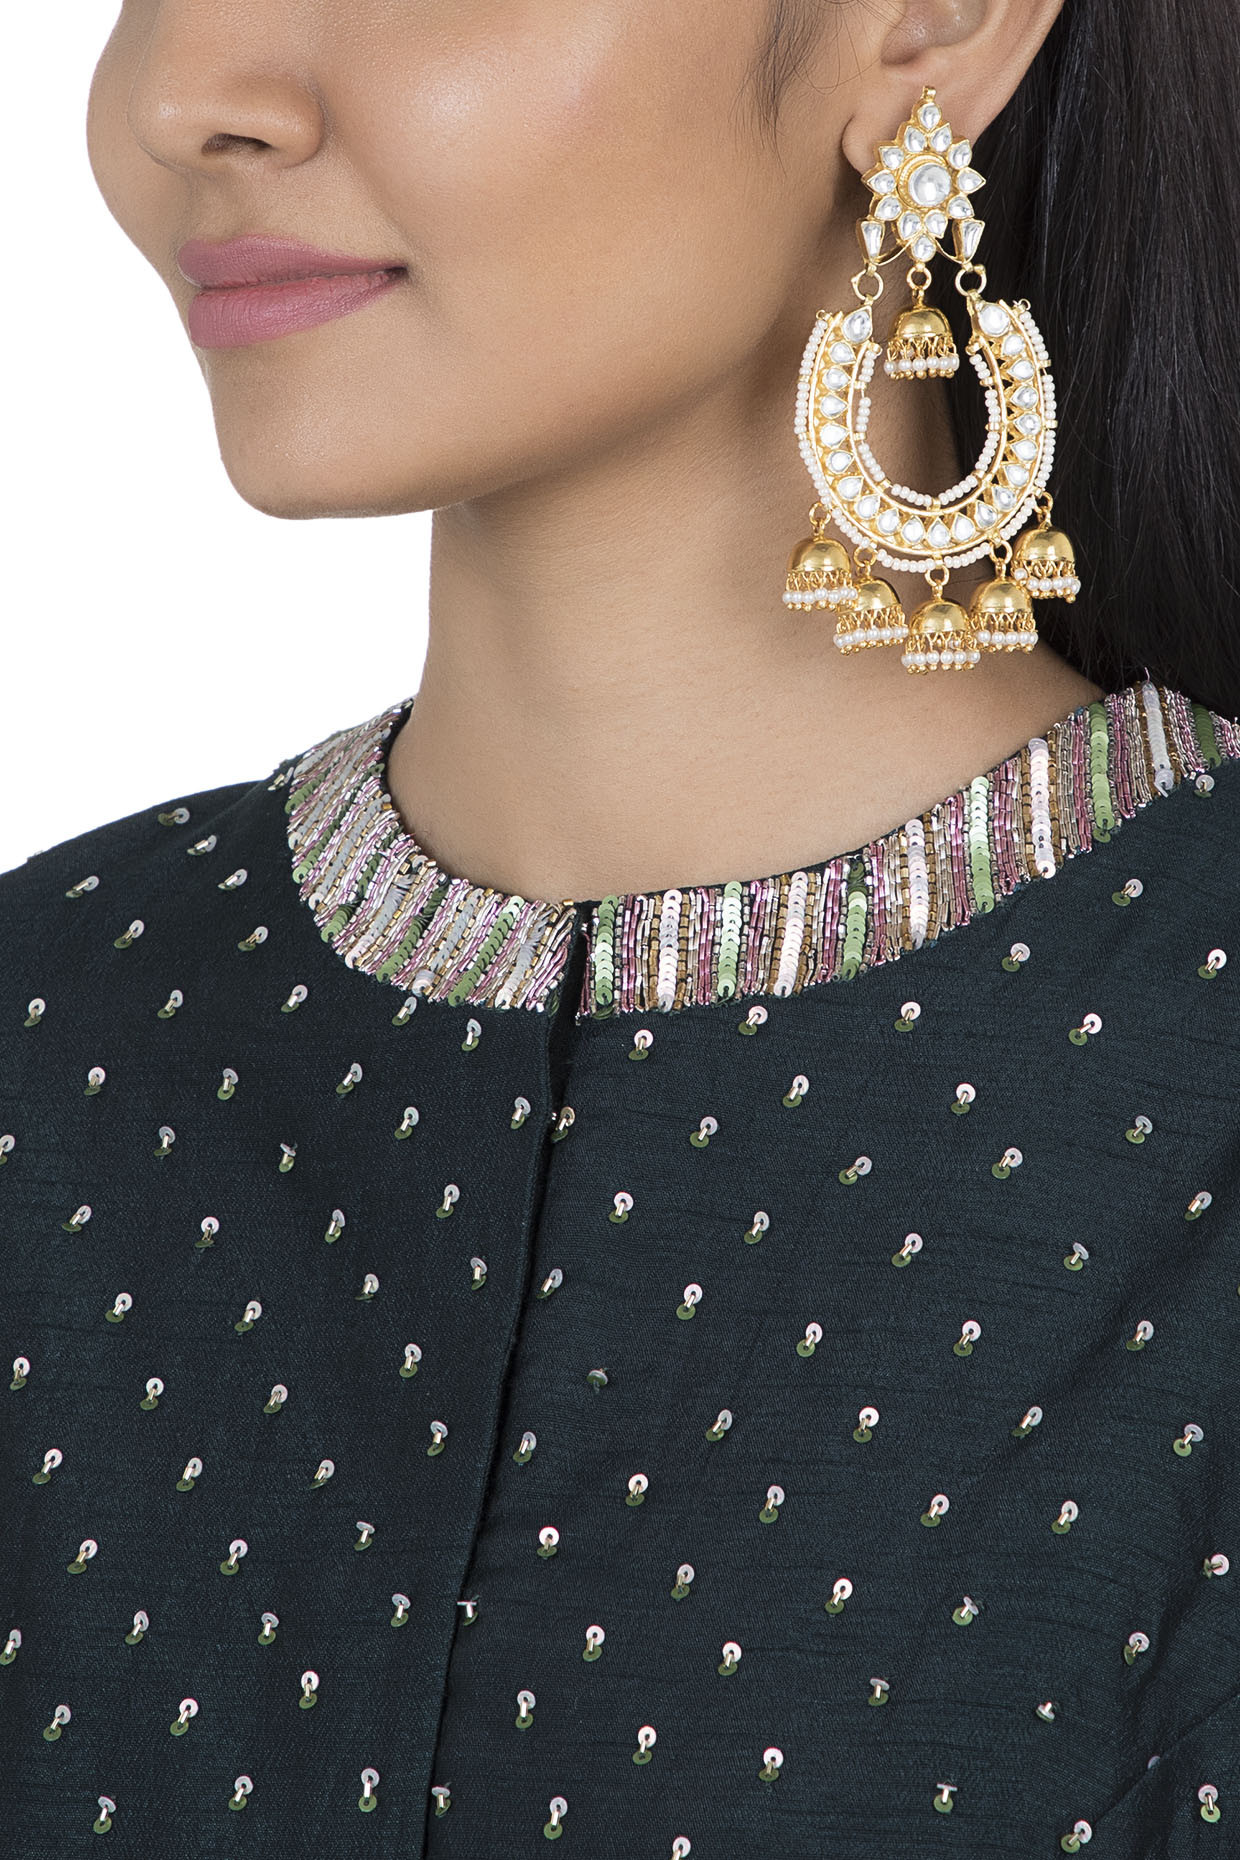 Gold plated faux kundan chandbali earrings by Aster